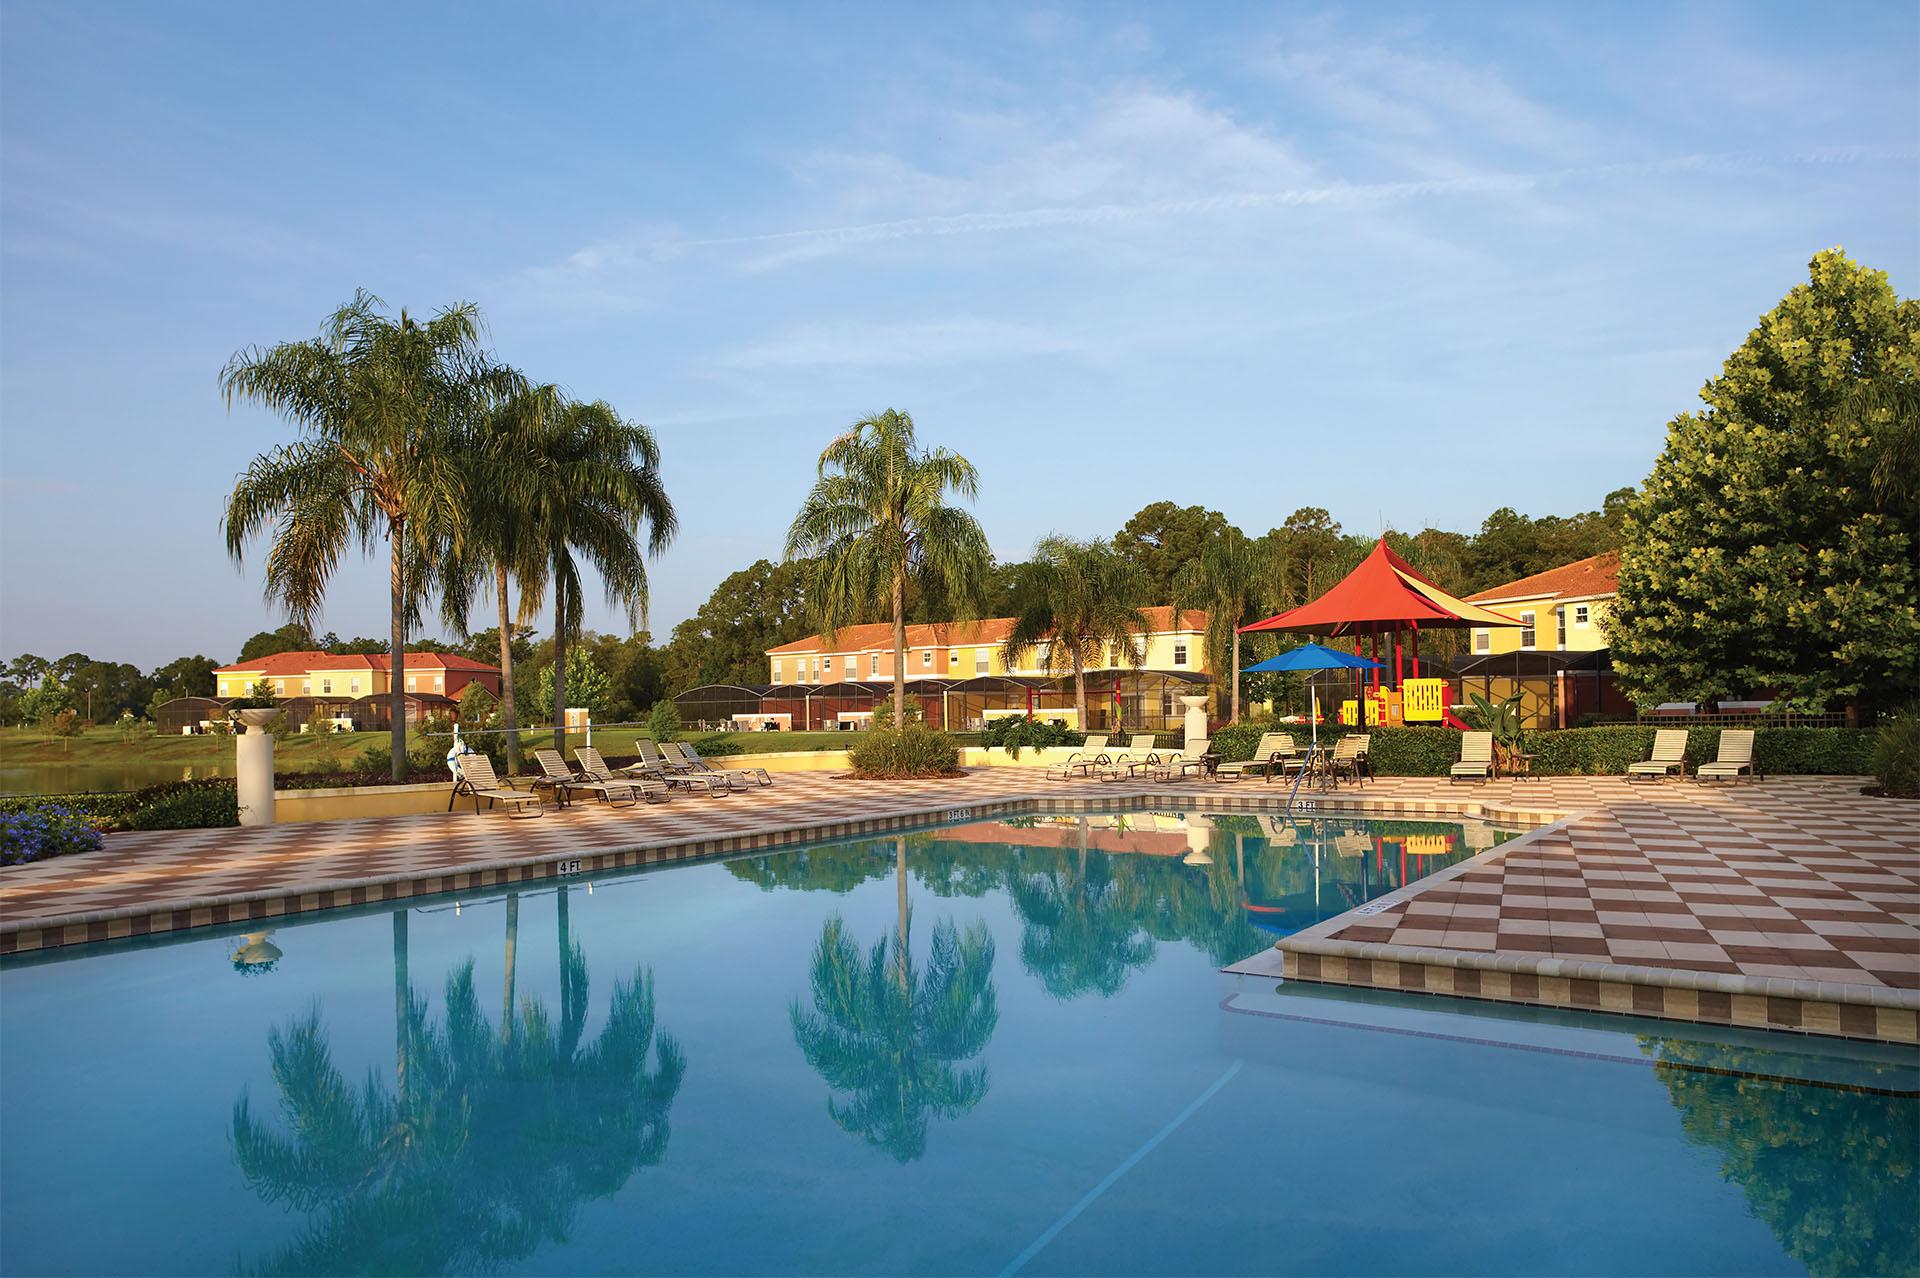 Encantada Resort Luker Properties Group